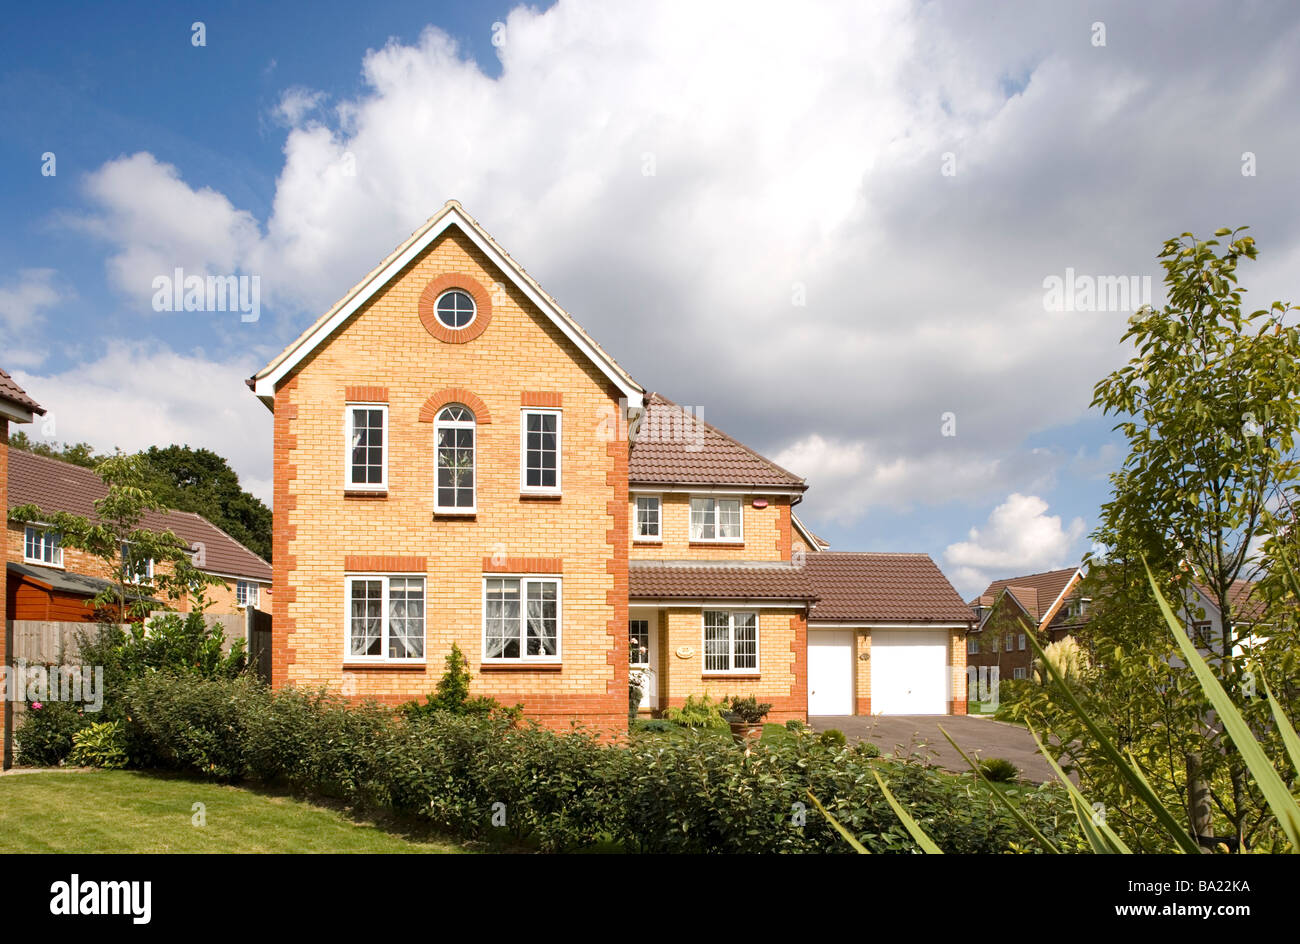 Modern detached house Kent England Stock Photo Royalty Free Image